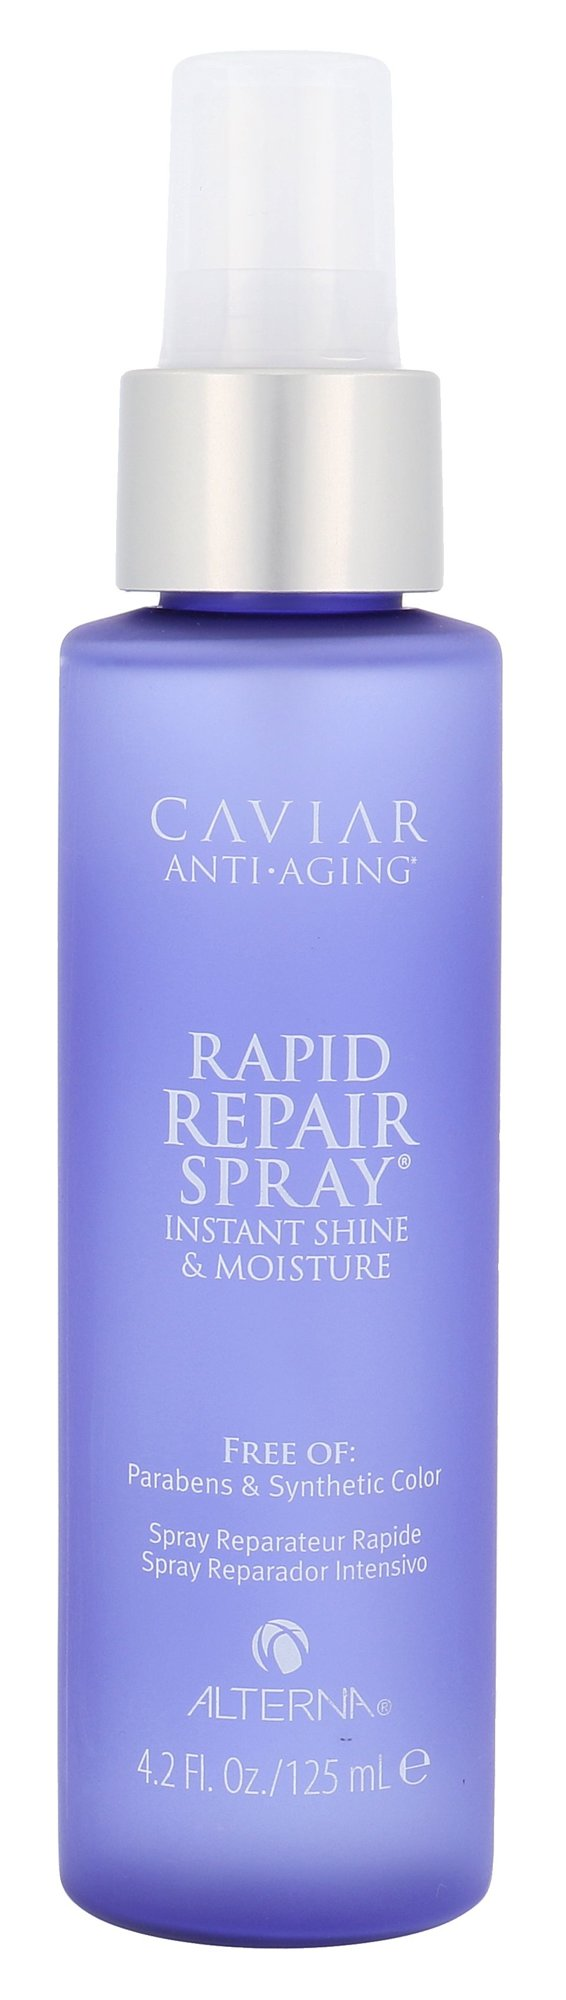 Alterna Caviar Anti-Aging Cosmetic 125ml